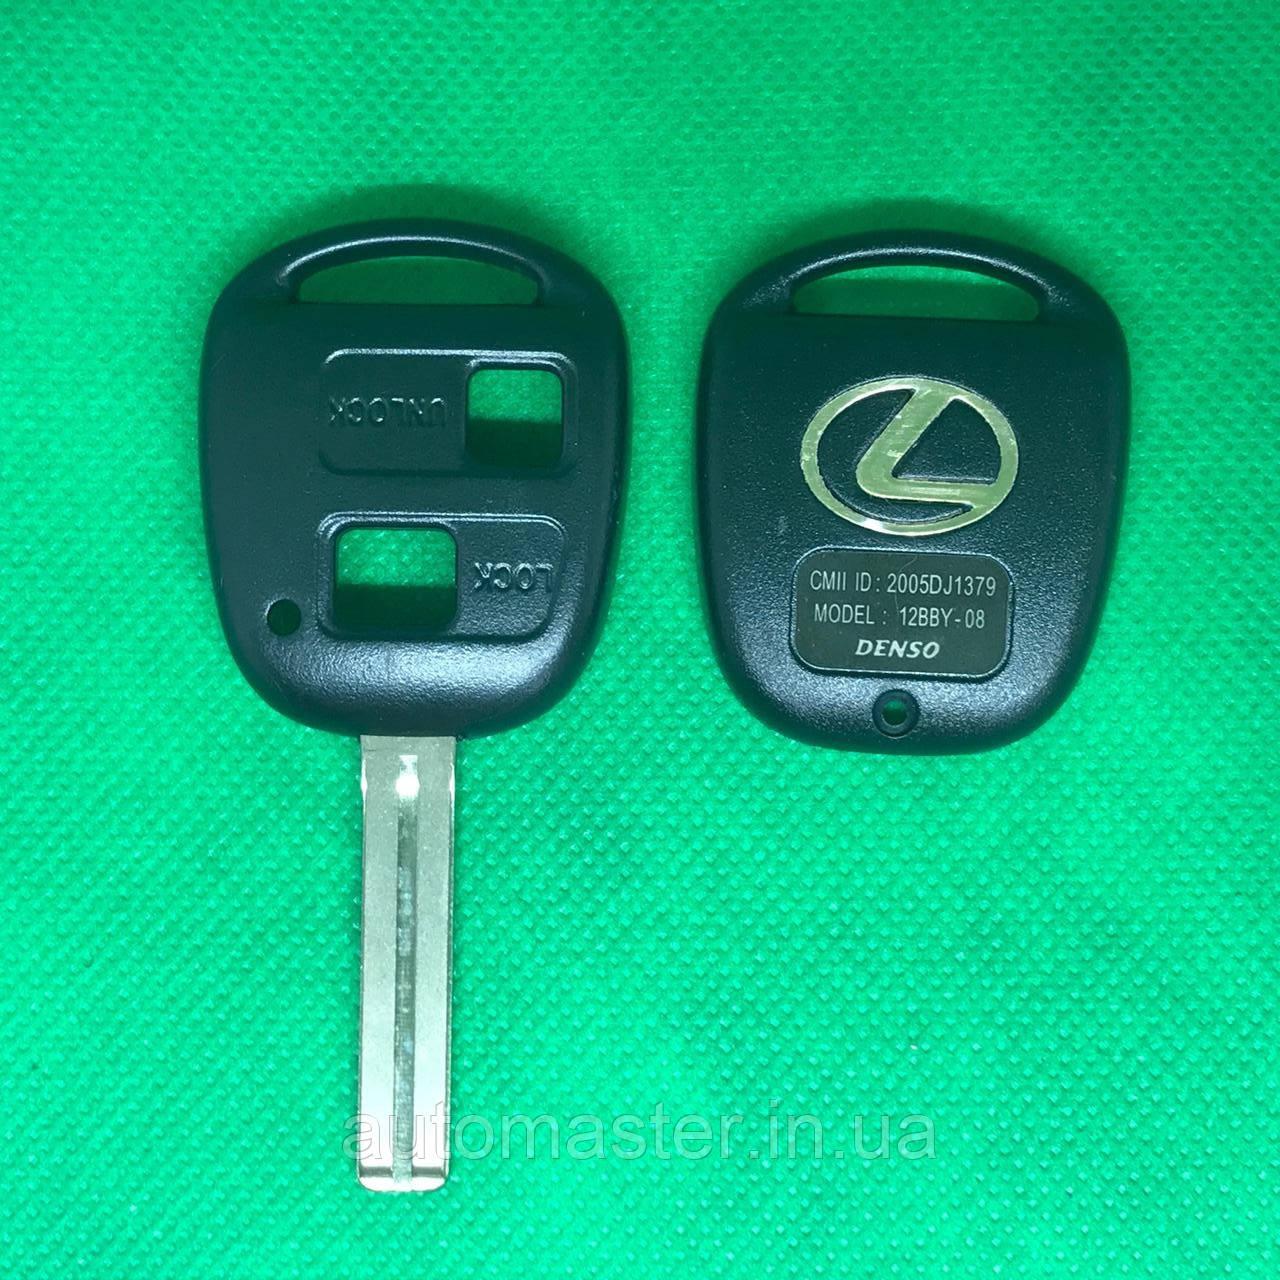 Корпус авто ключа LEXUS (Лексус) 2 - кнопки, лезвие TOY40